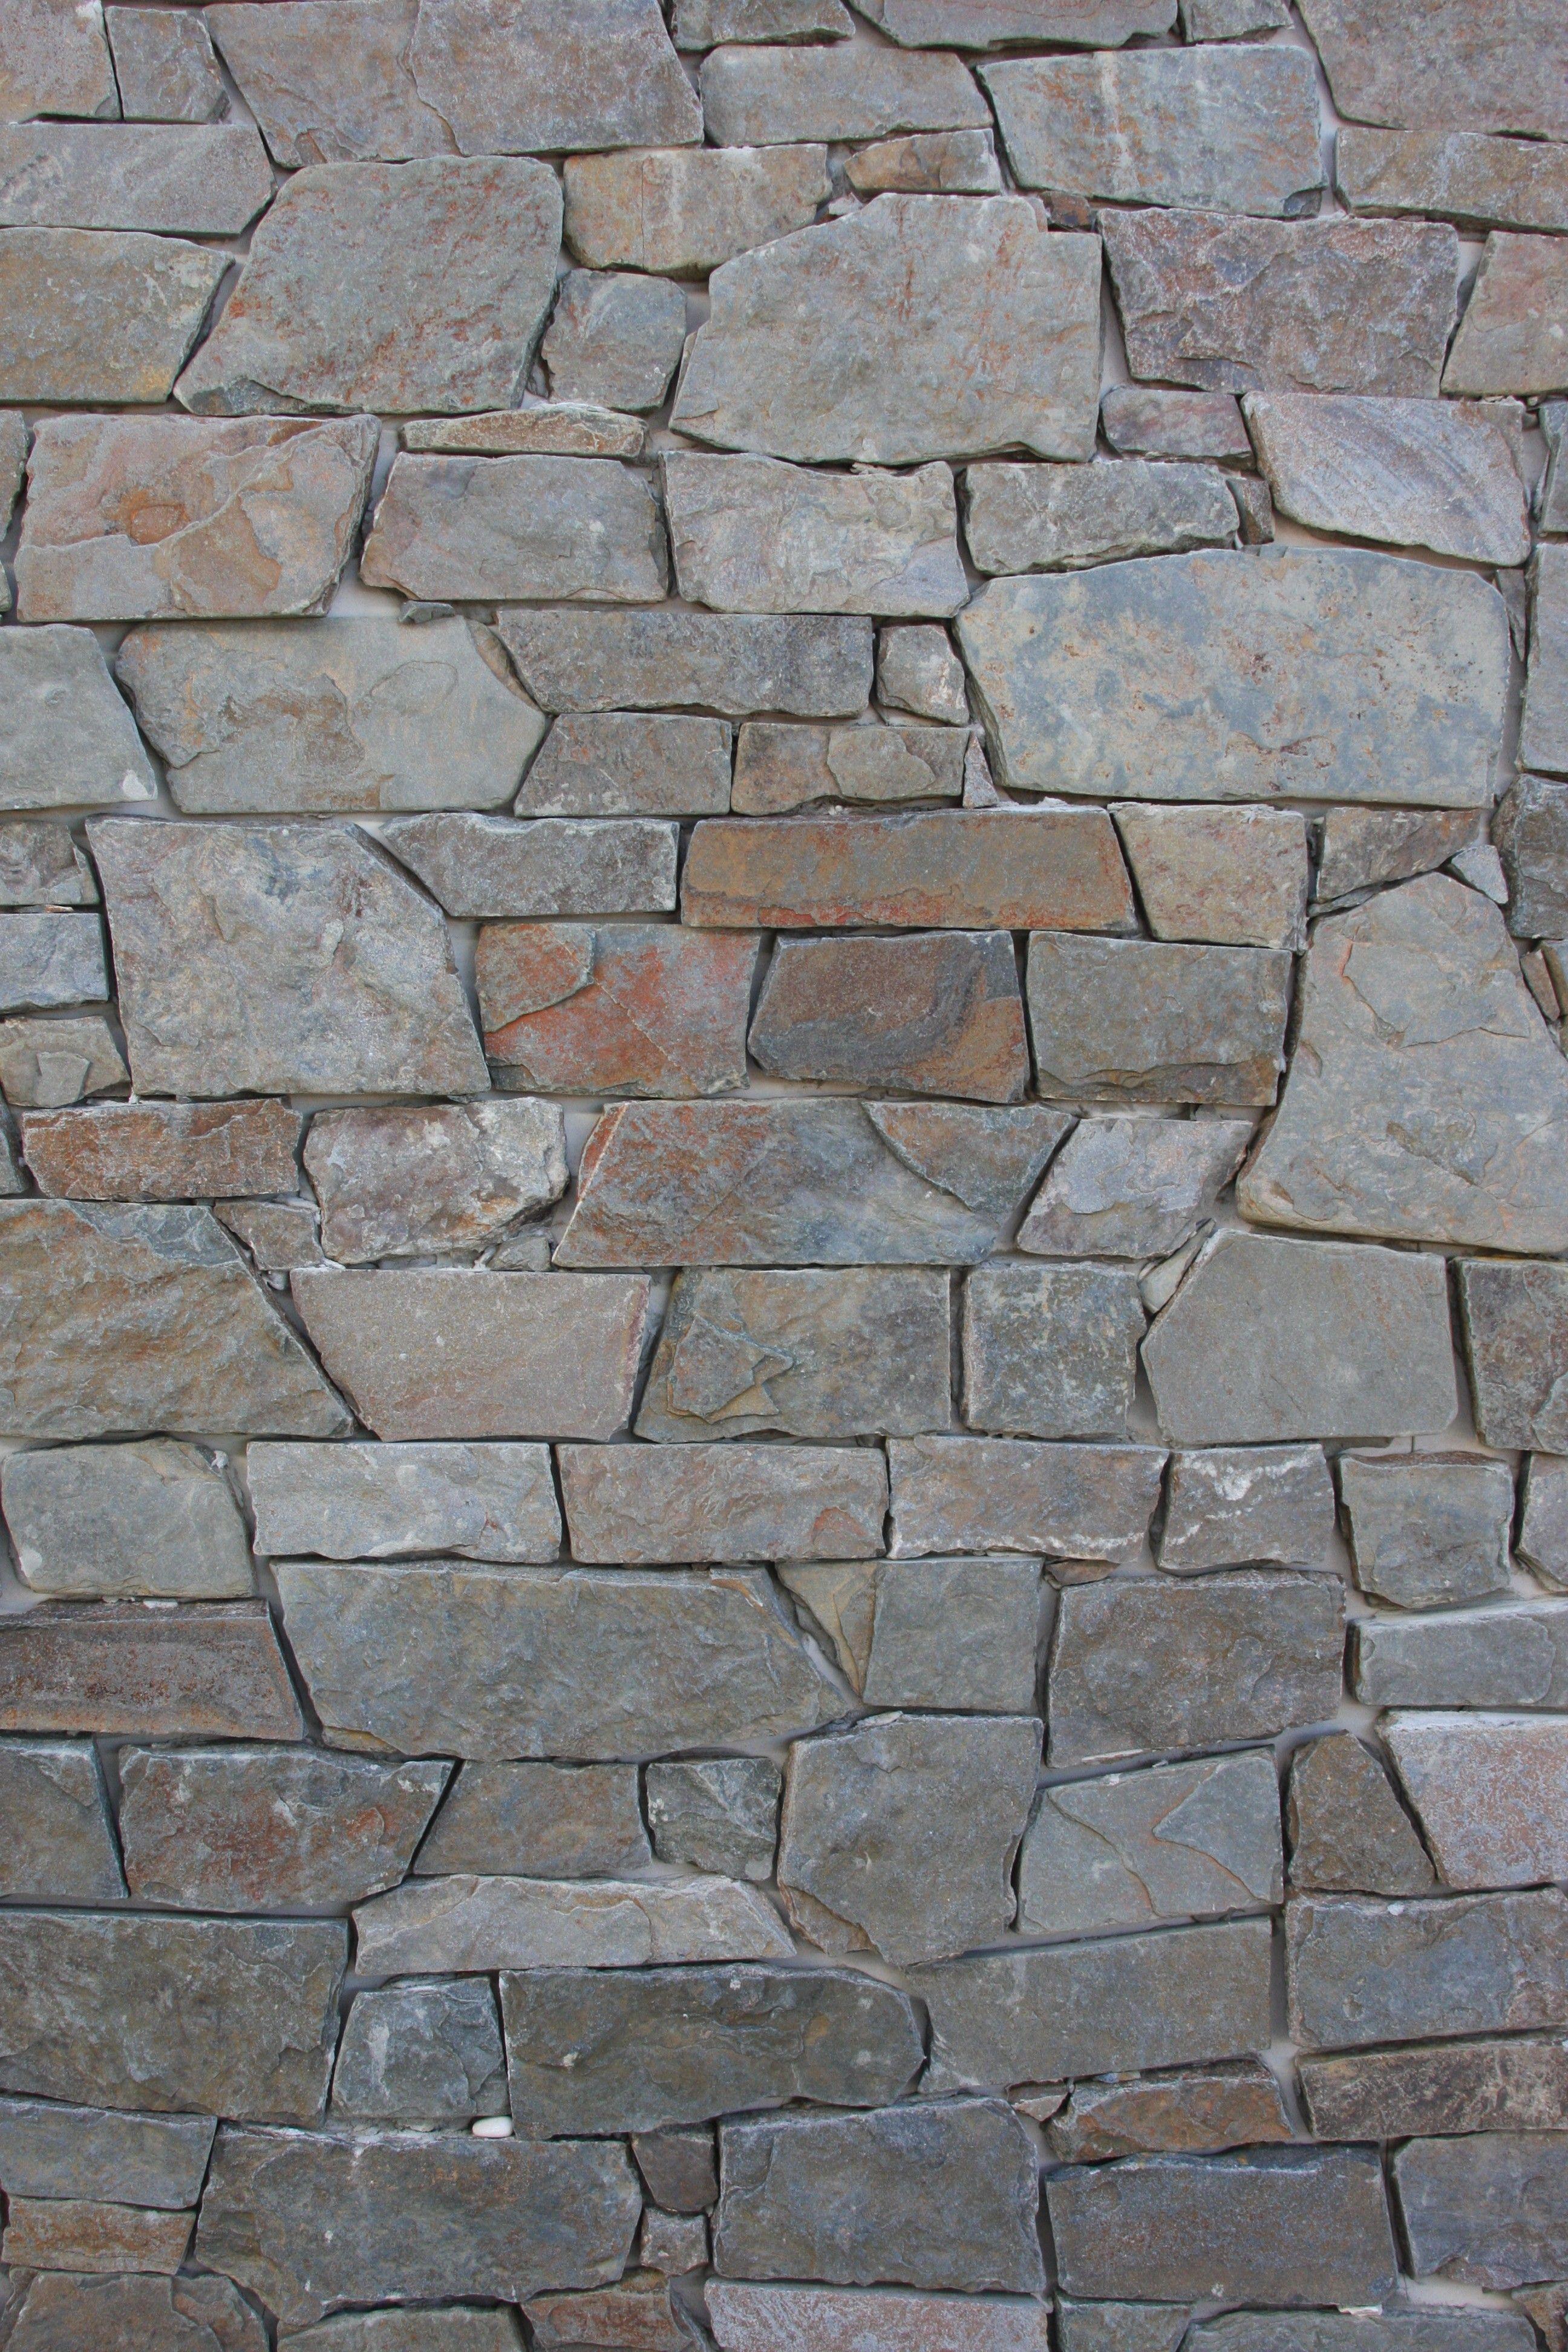 Tyrol Walling Wall Cladding Surfaces Wall Cladding Walling Cladding